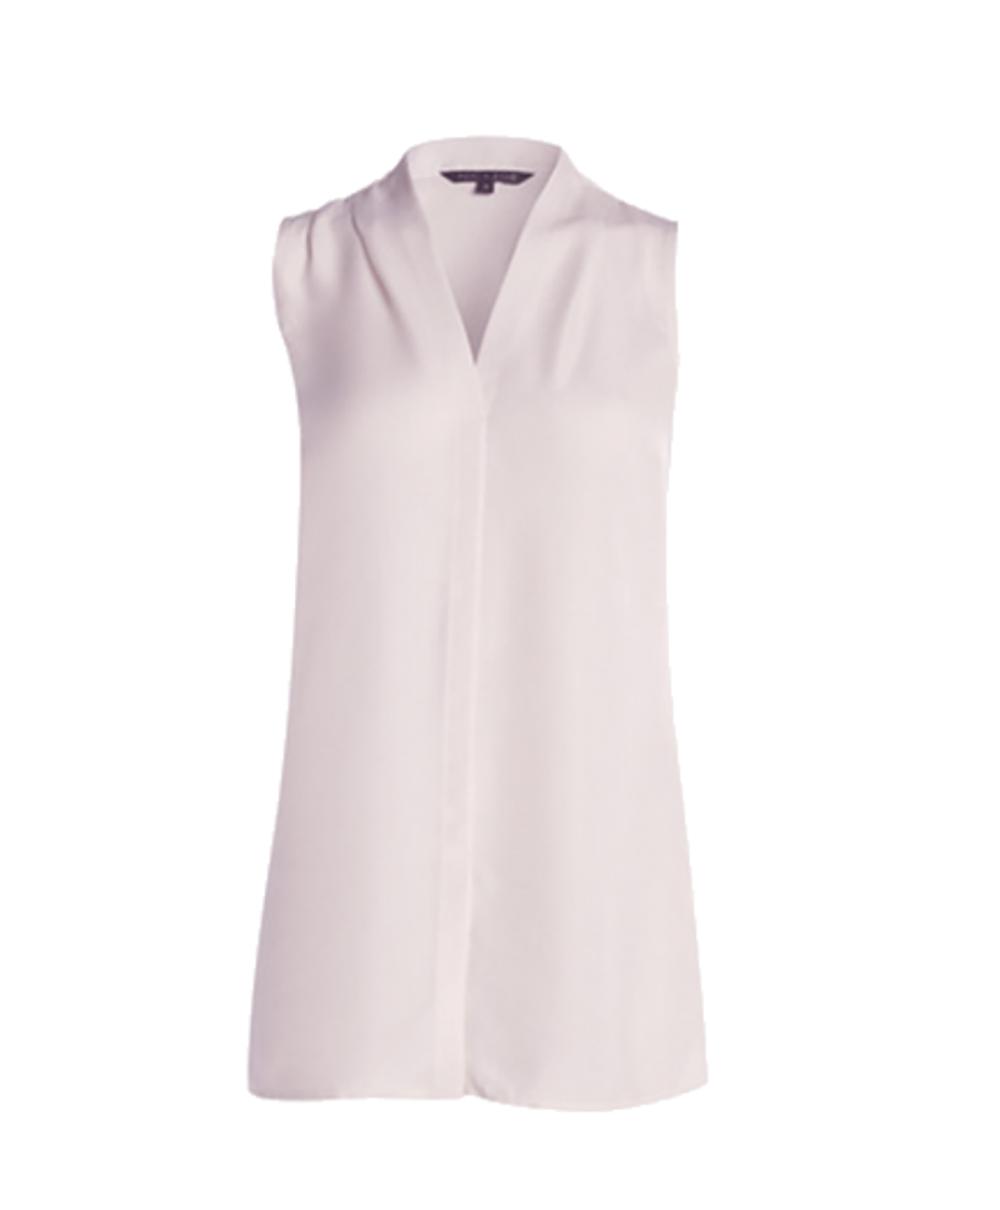 simple blouse pnk.png